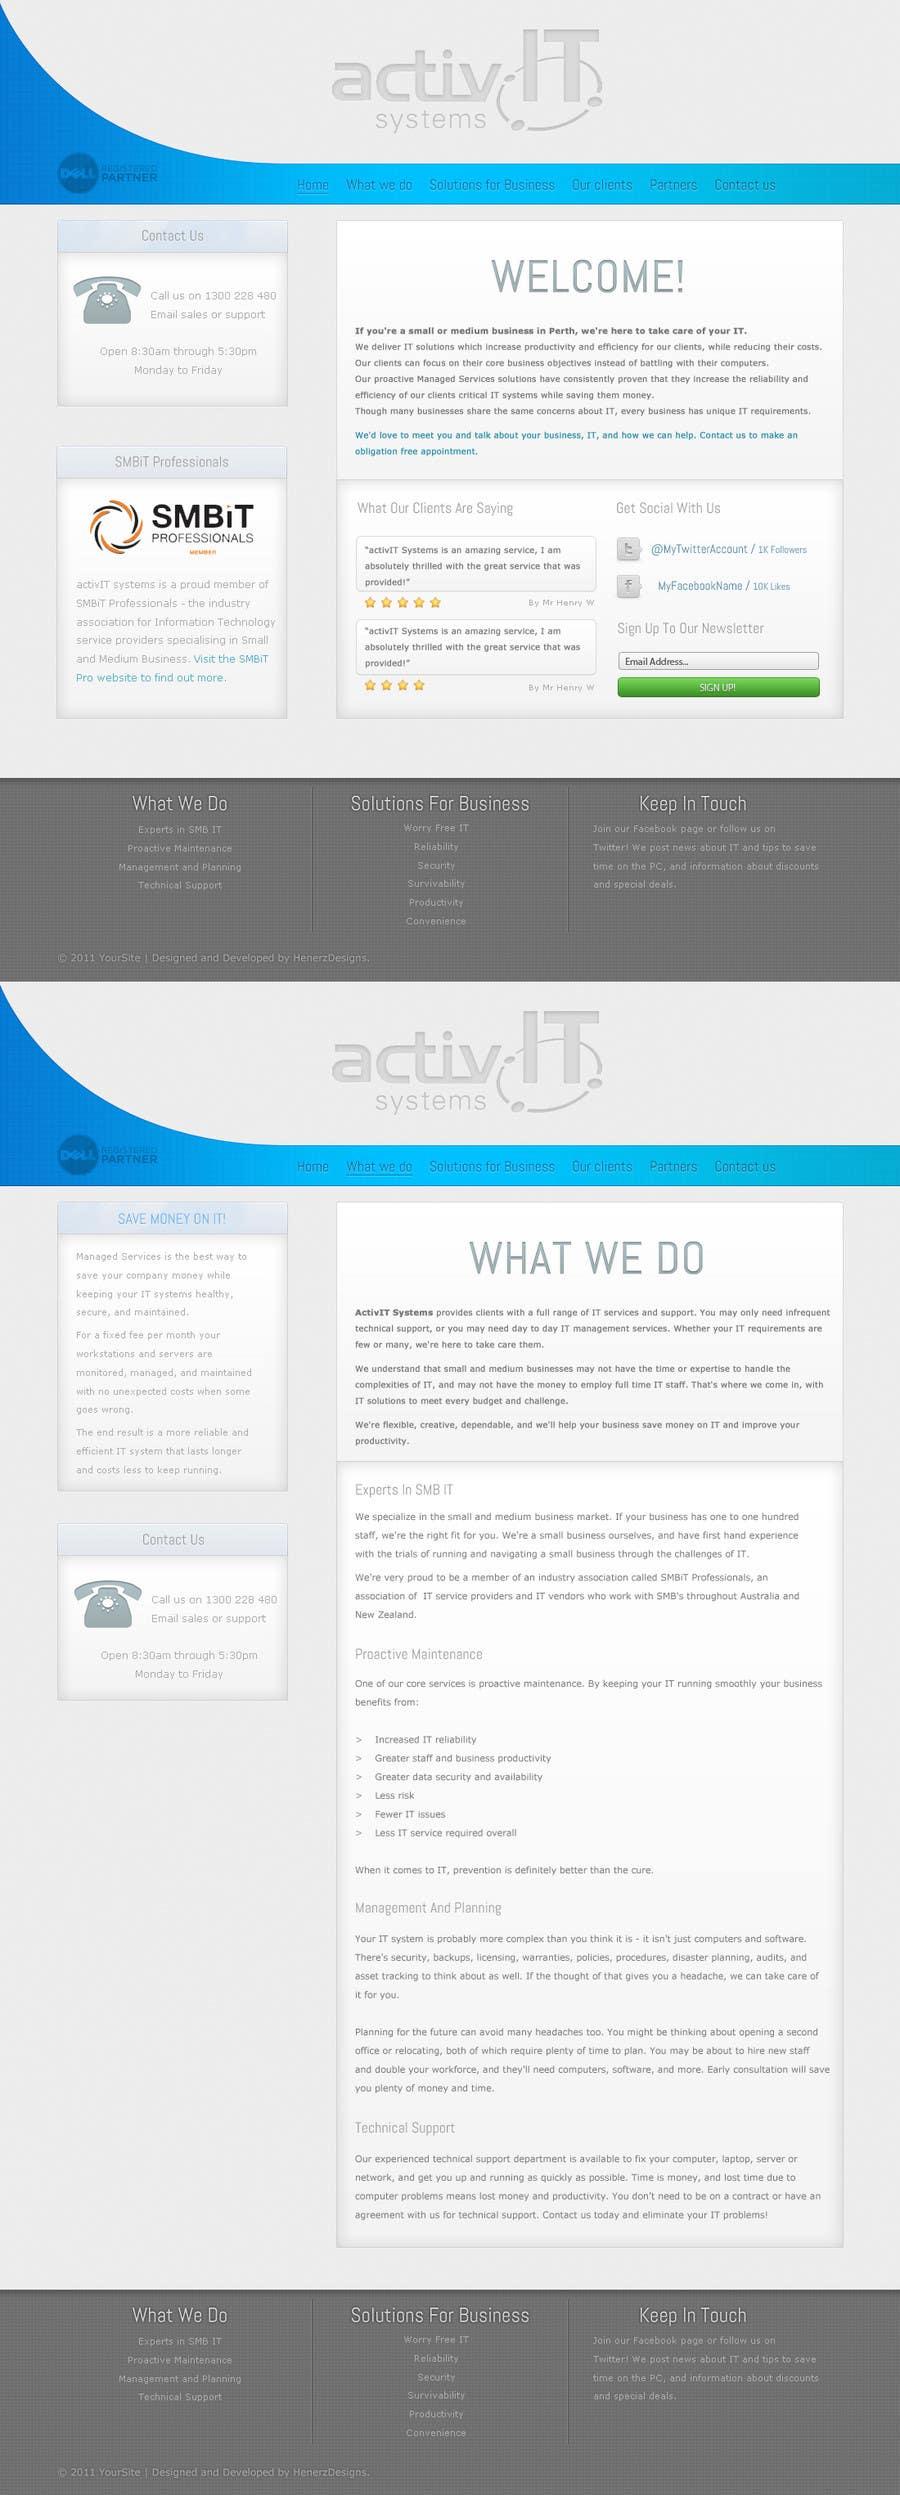 Penyertaan Peraduan #37 untuk Website Design for activIT systems